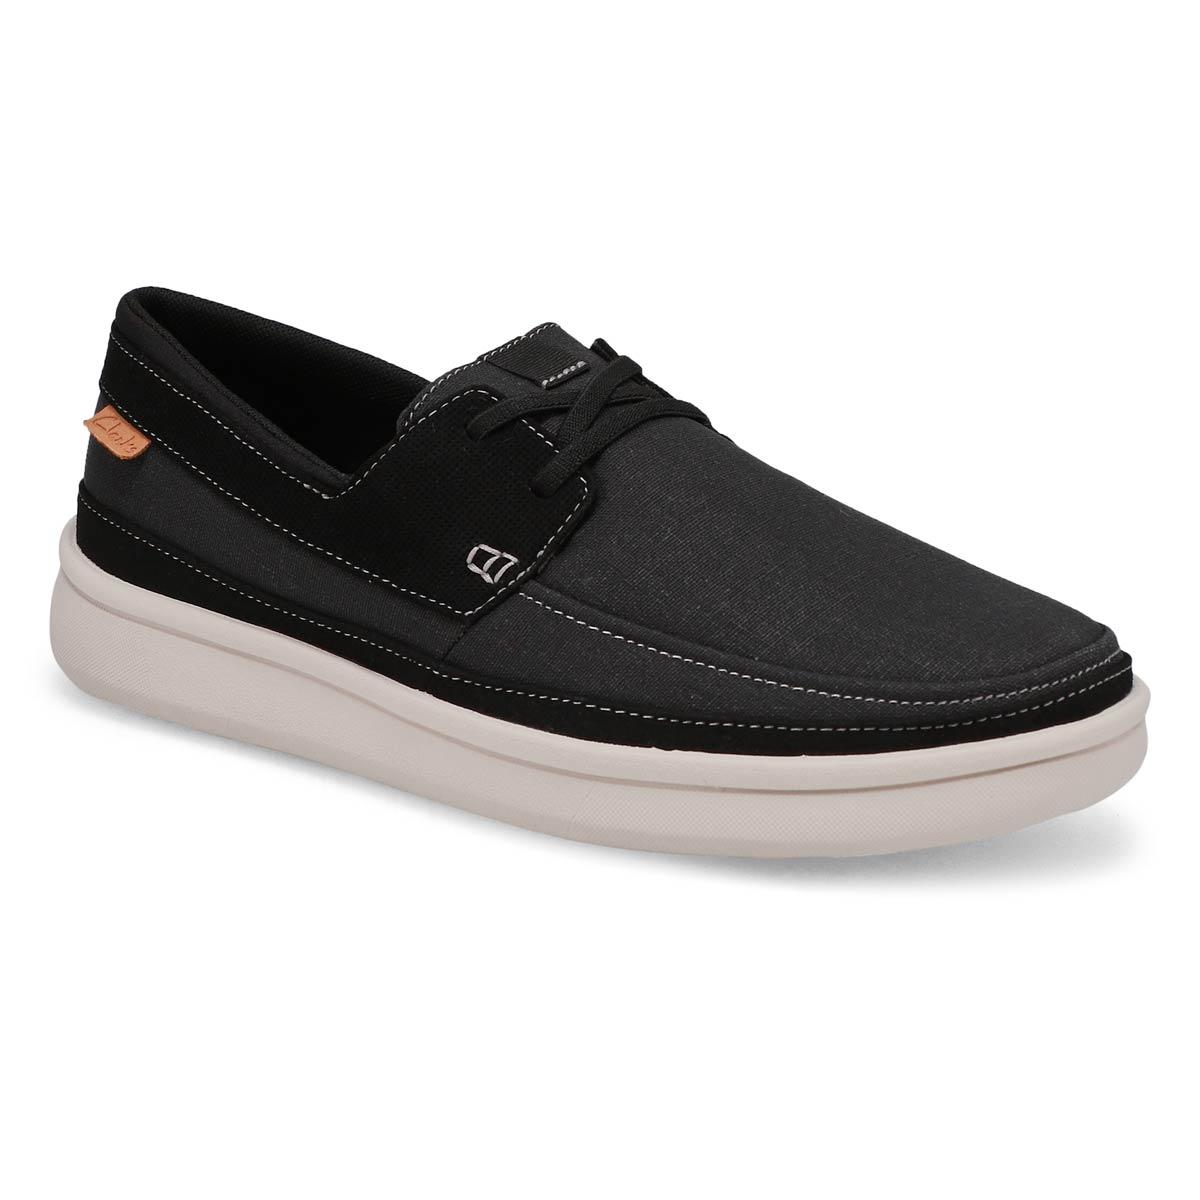 Chaussures CHANTAL LACE noir hommes